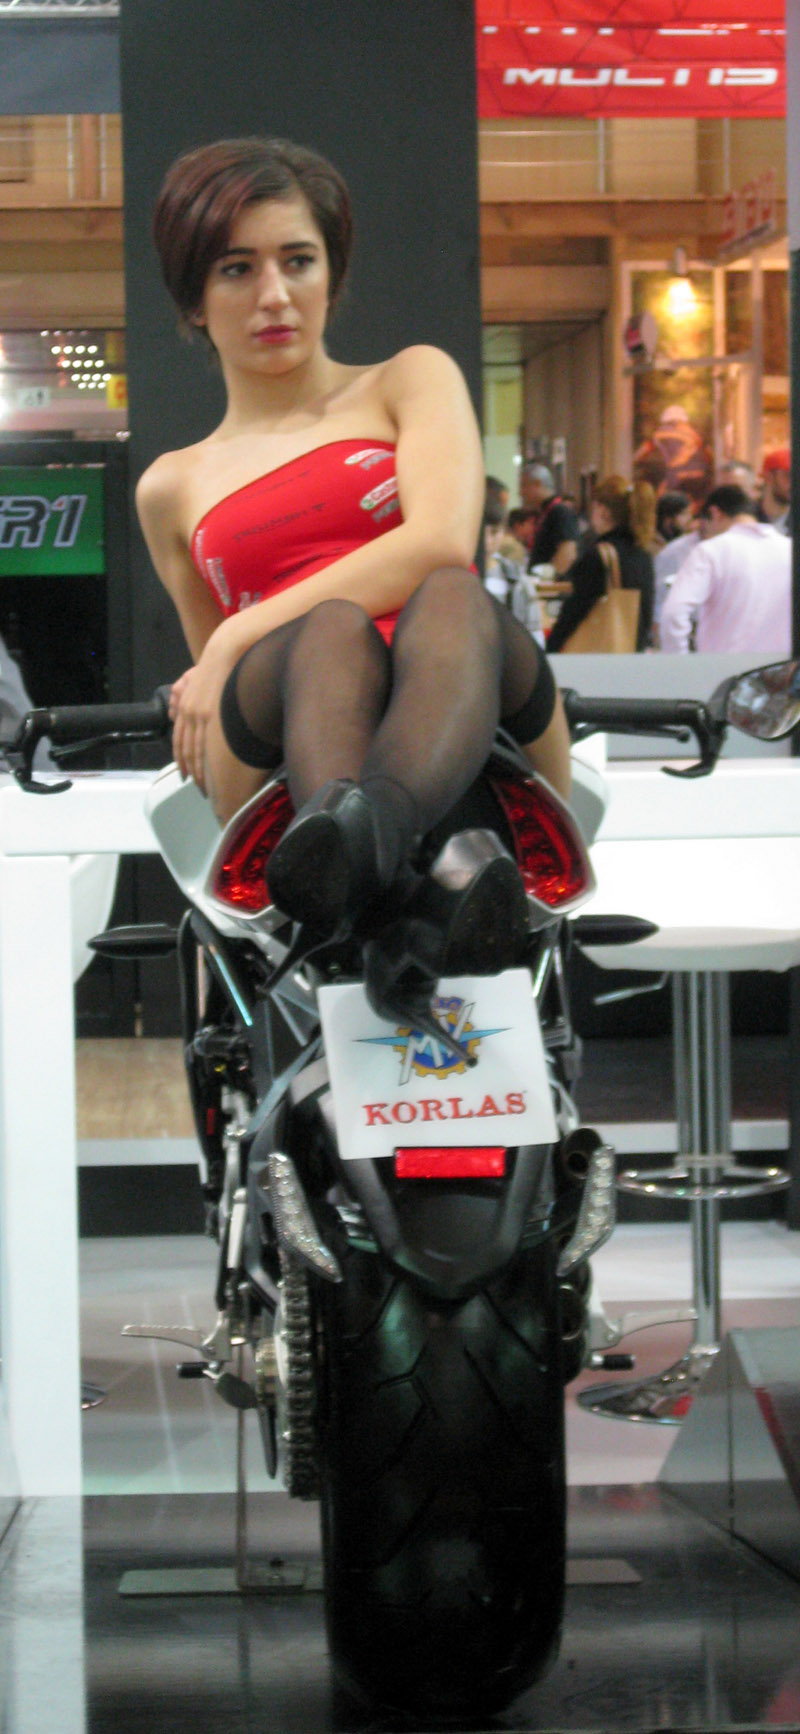 Eurasia Moto Bike Expo, Korlas, Seksi Manken